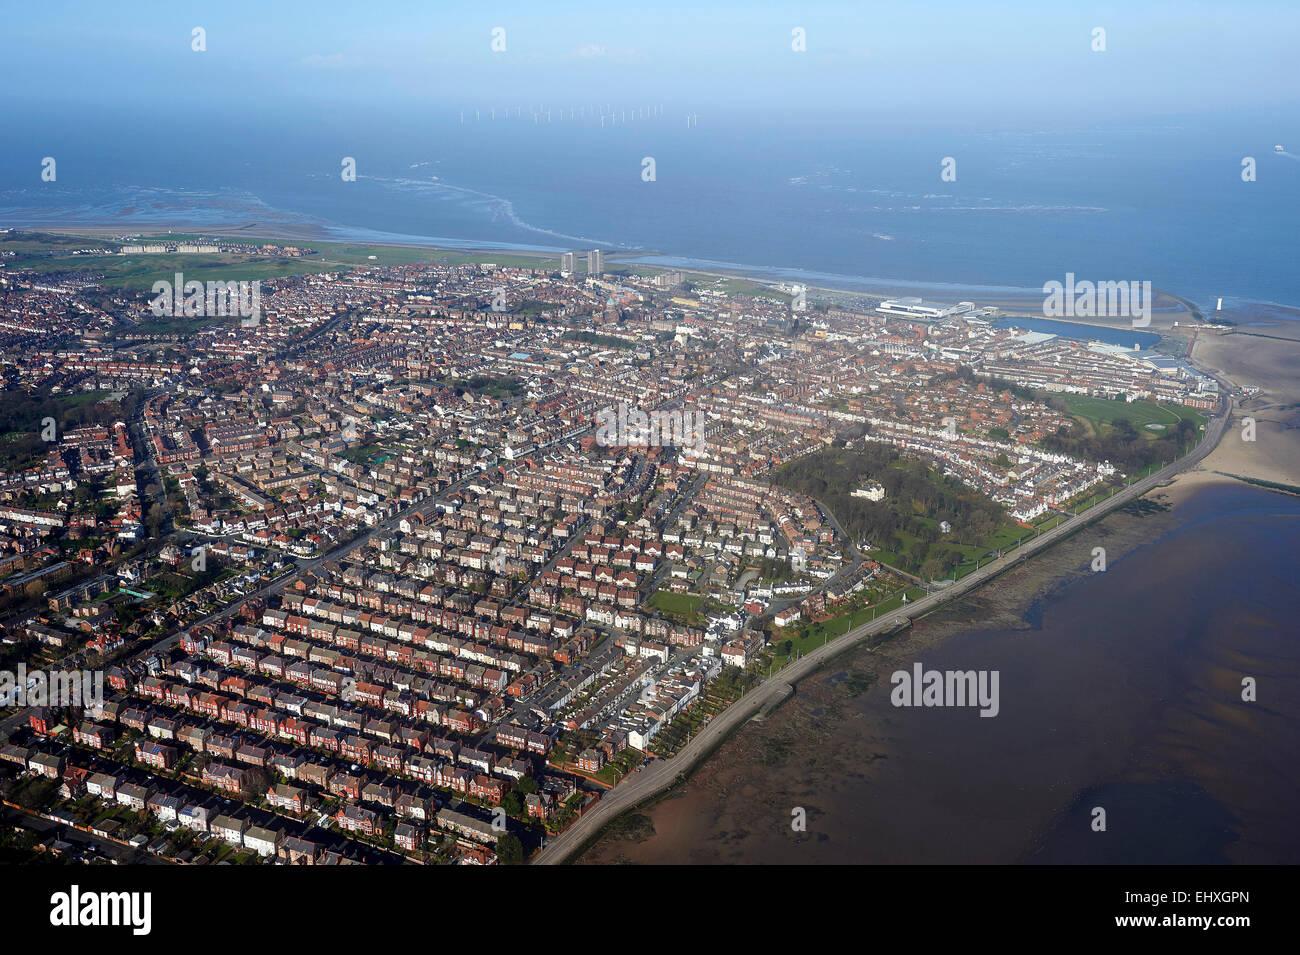 New Brighton, Birkenhead, Merseyside, North West England, UK - Stock Image